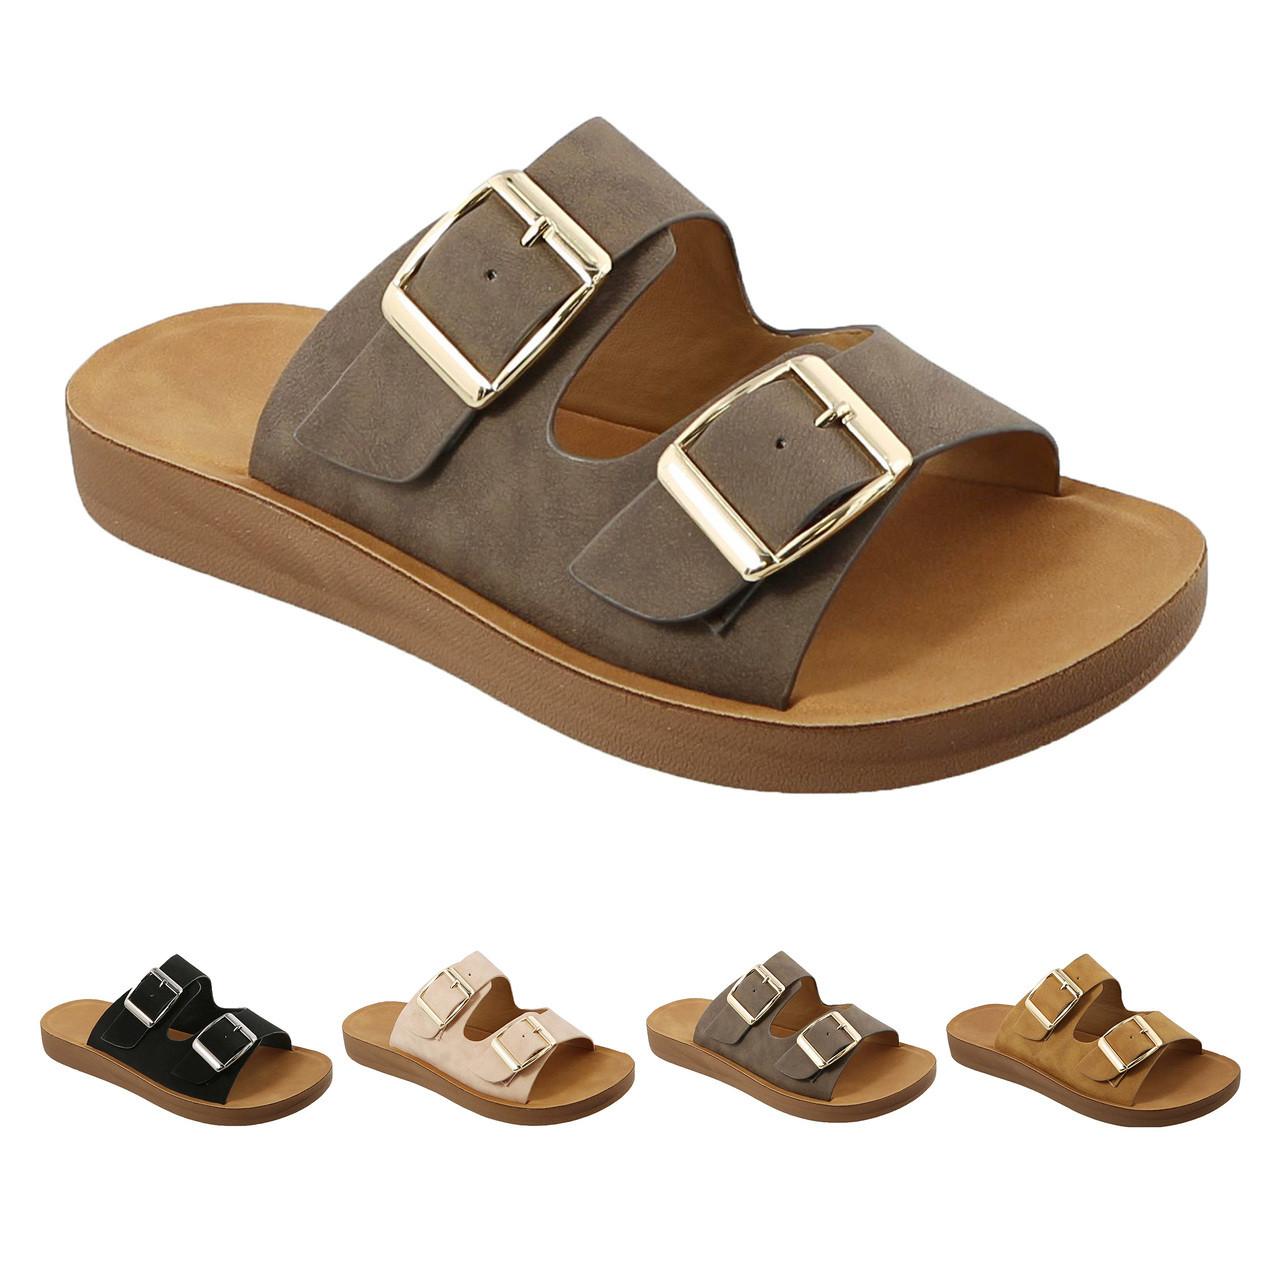 4e08a6260 Trends SNJ Women s Super Comfort Lightweight Flat Slide Double Strap Nubuck  Sandal